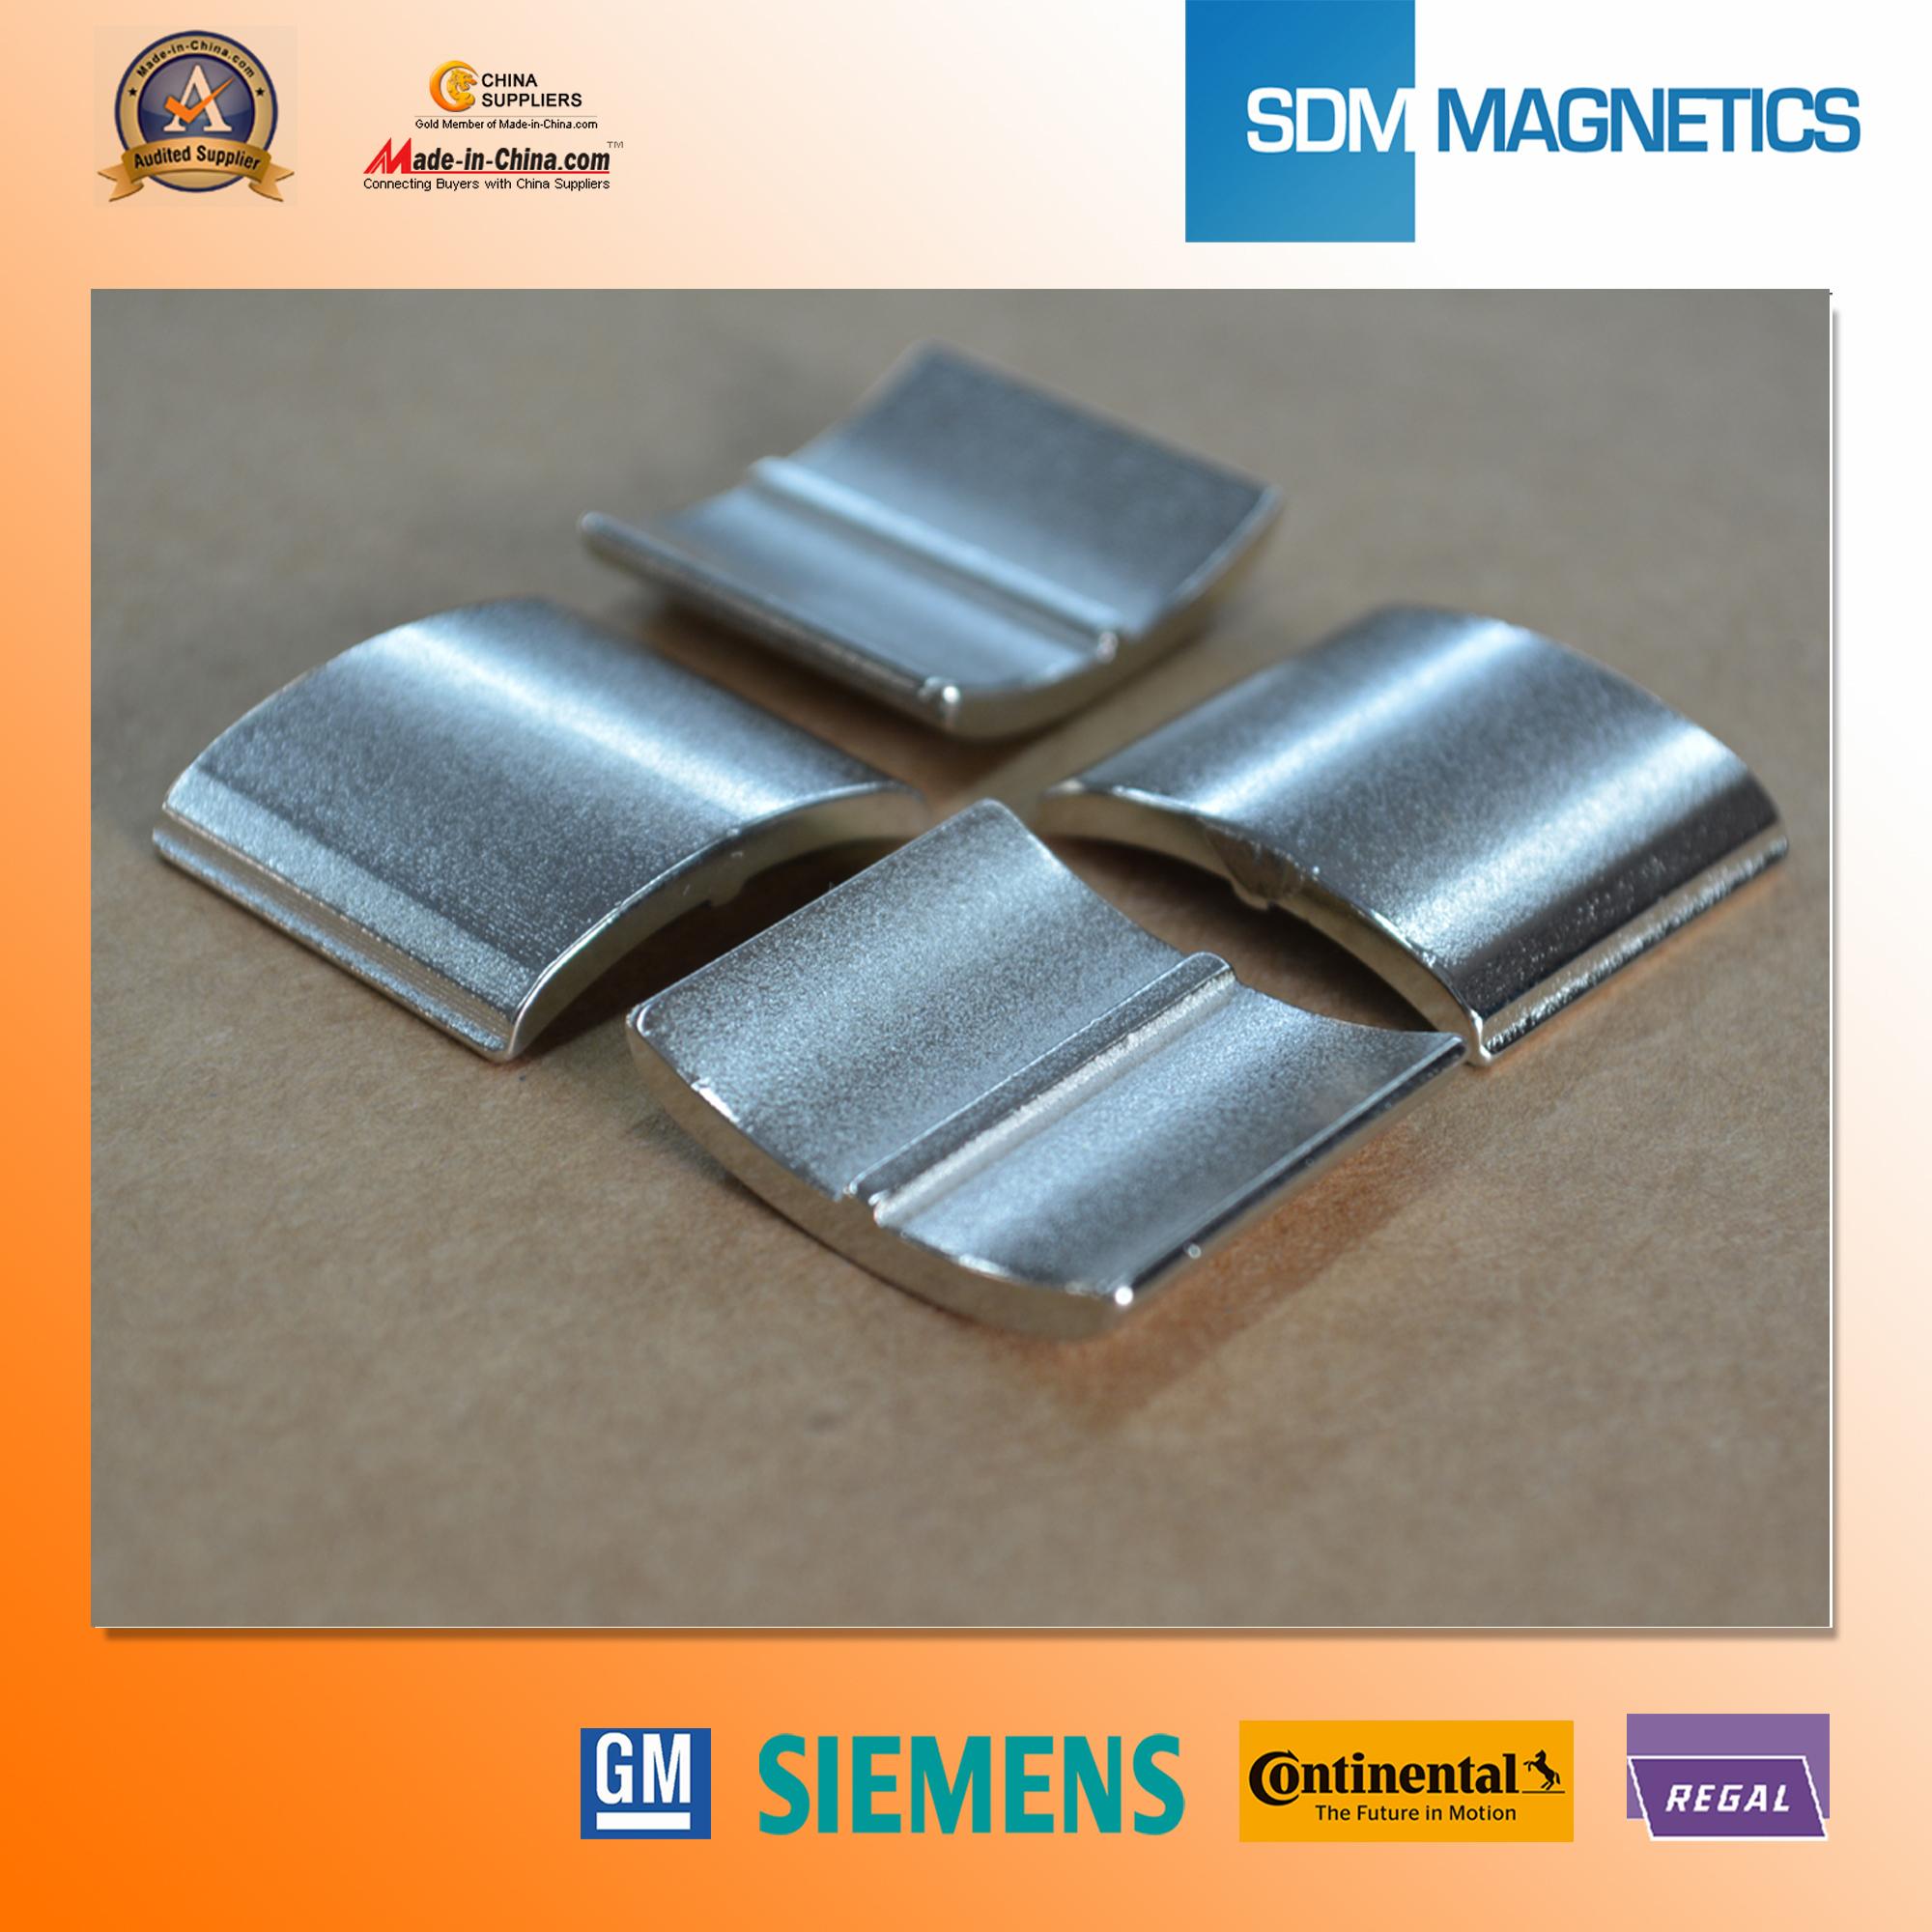 SDM Magnetics Brief Introduction